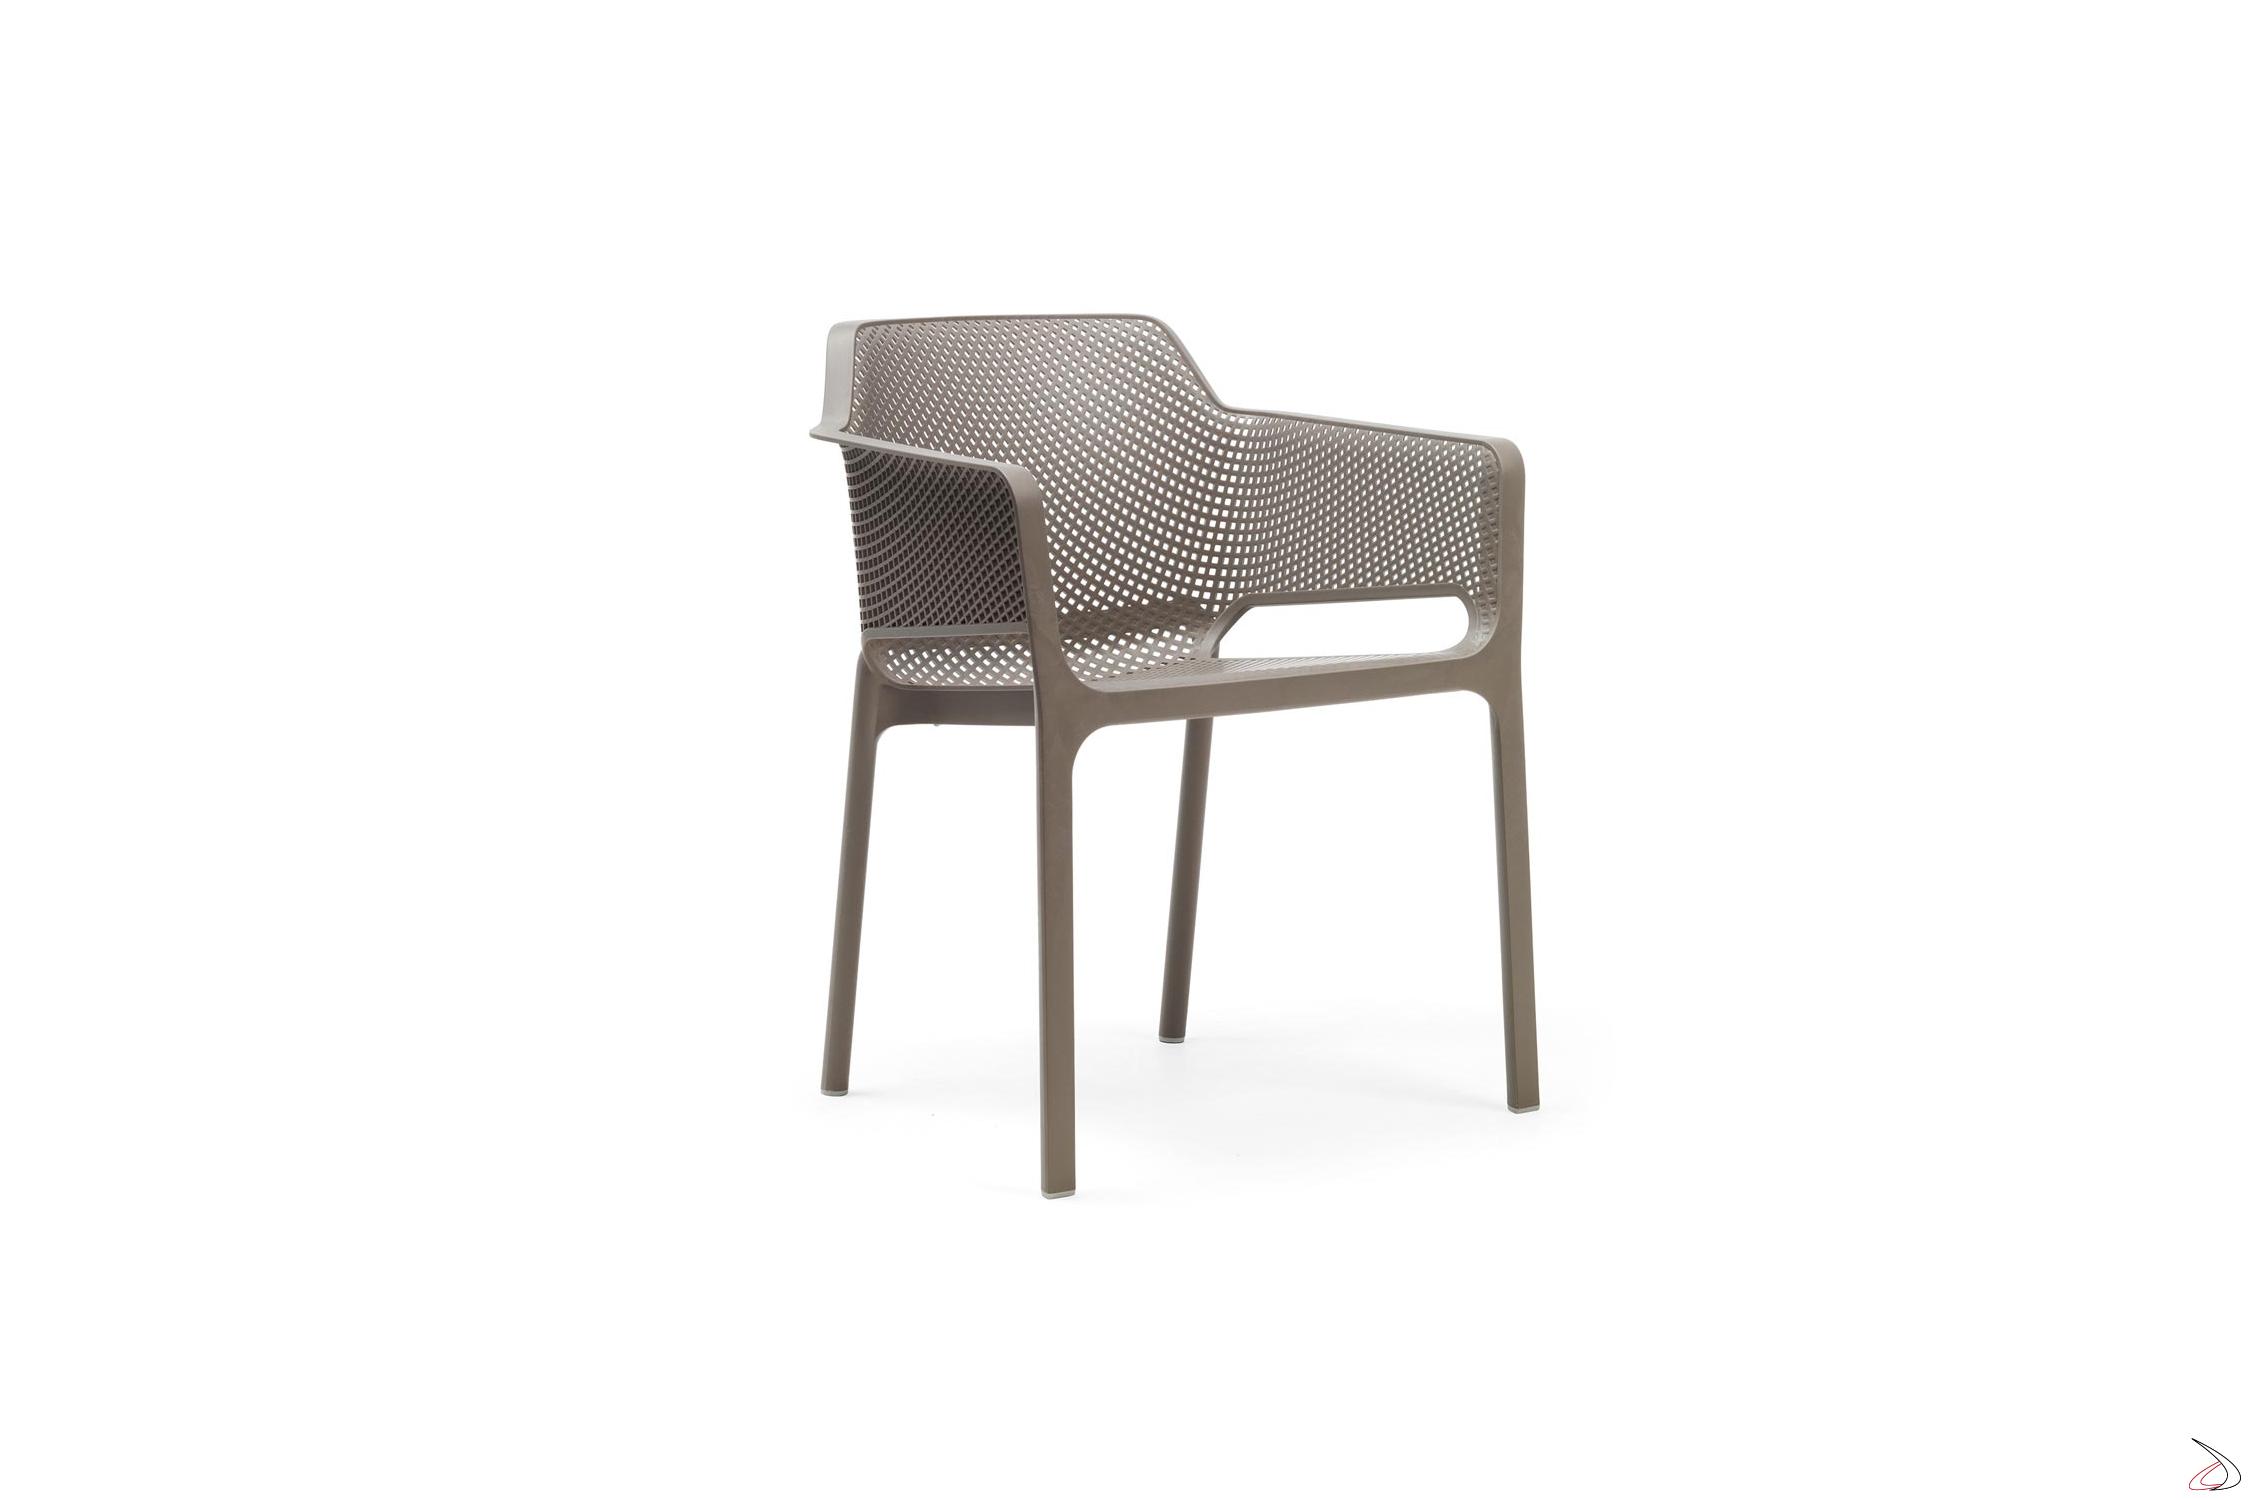 Sedie In Resina Colorate.Sedia Colorata Da Giardino Net Toparredi Arredo Design Online